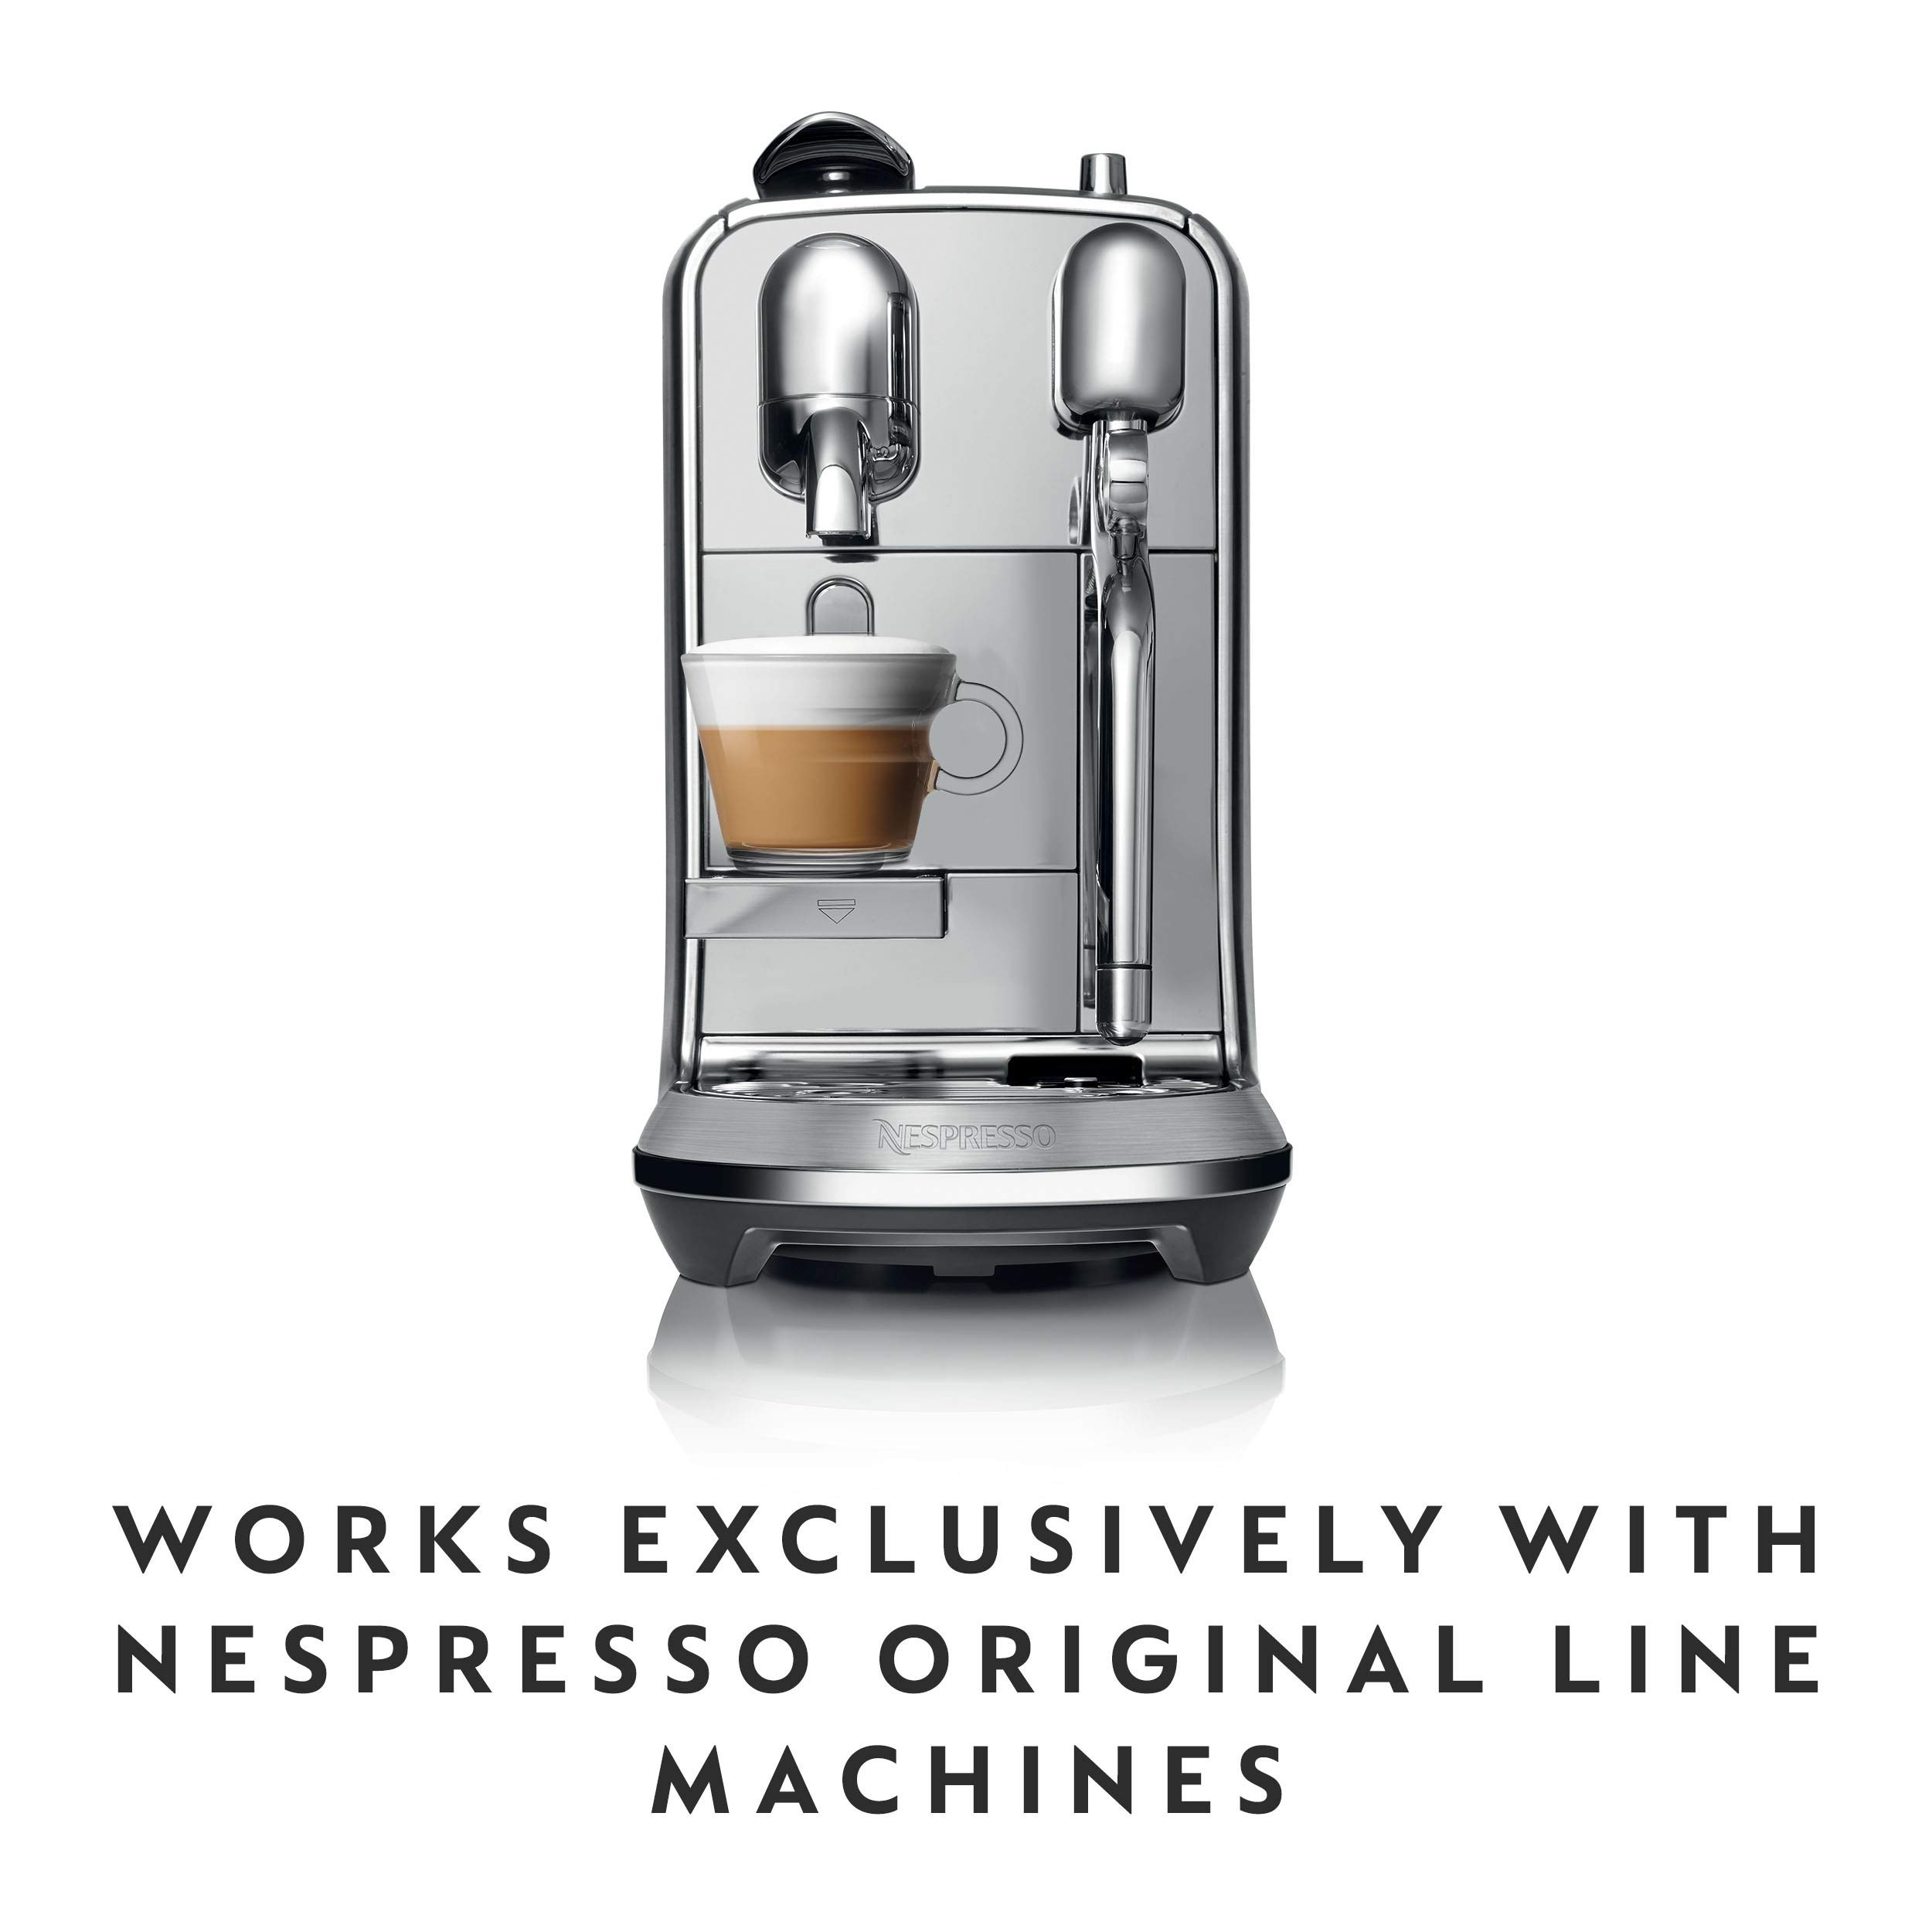 Nespresso Capsules OriginalLine, Arpeggio Decaffeinato, Dark Roast Coffee, Coffee Pods, Brews,1.35 Fl Oz (Pack of 50)